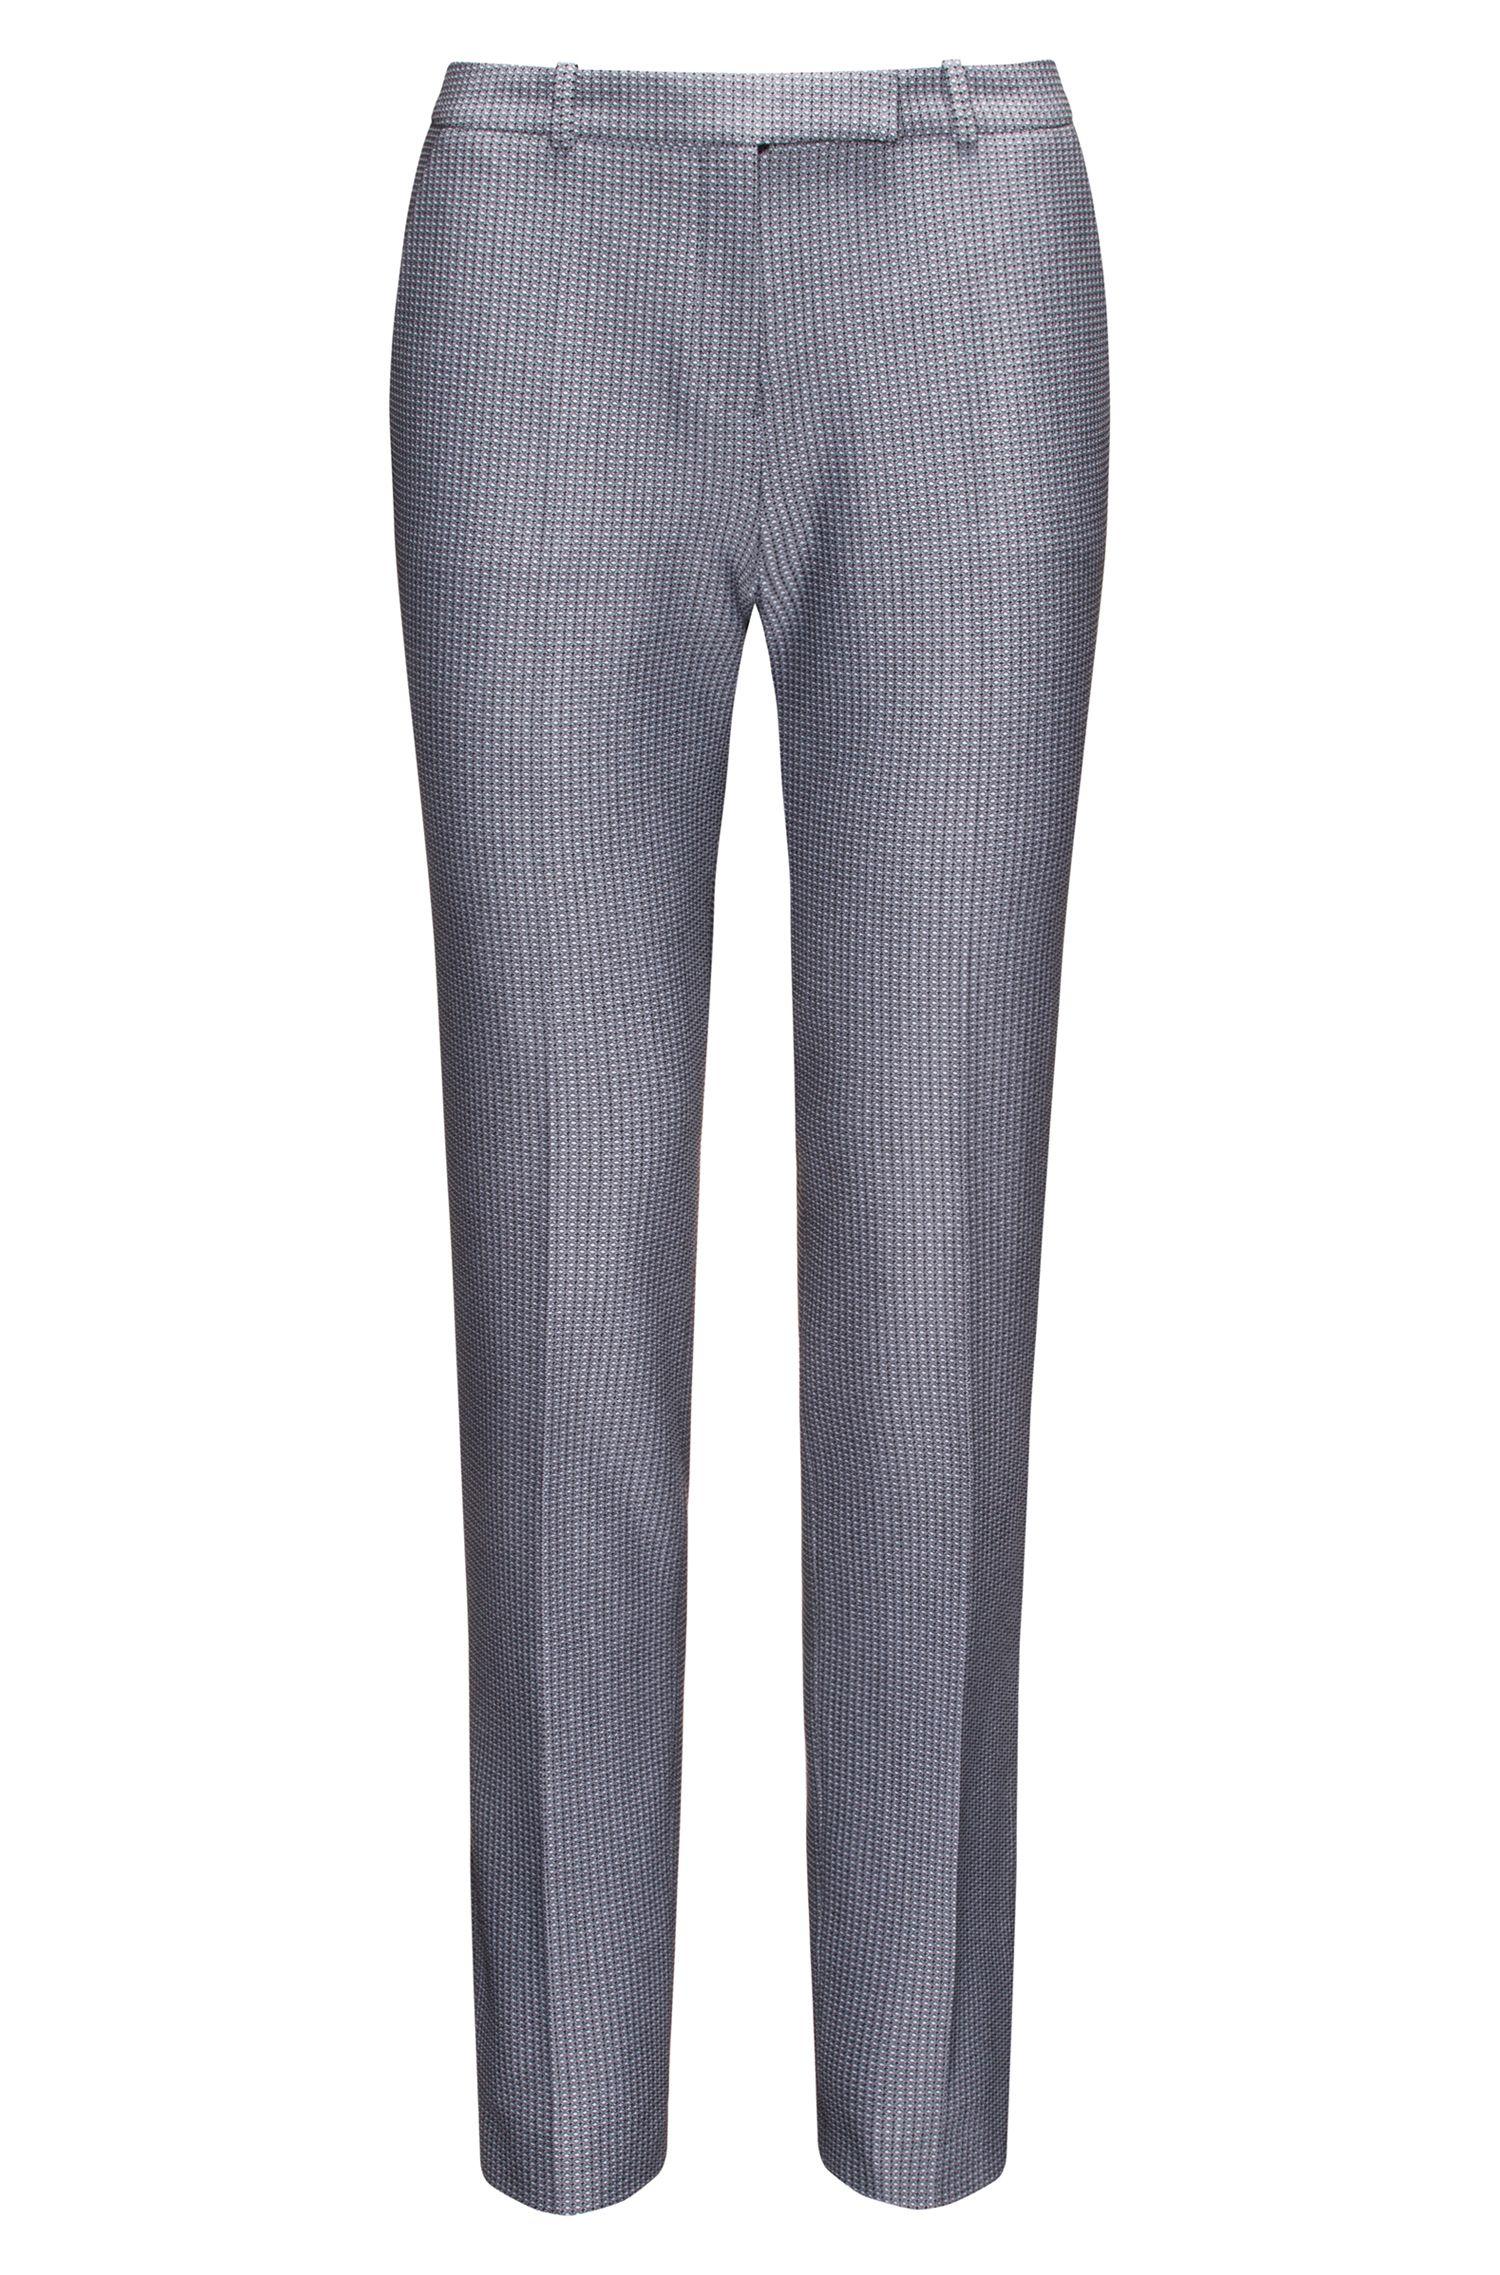 Pantalon cigarette Regular Fit en tissu de poids moyen